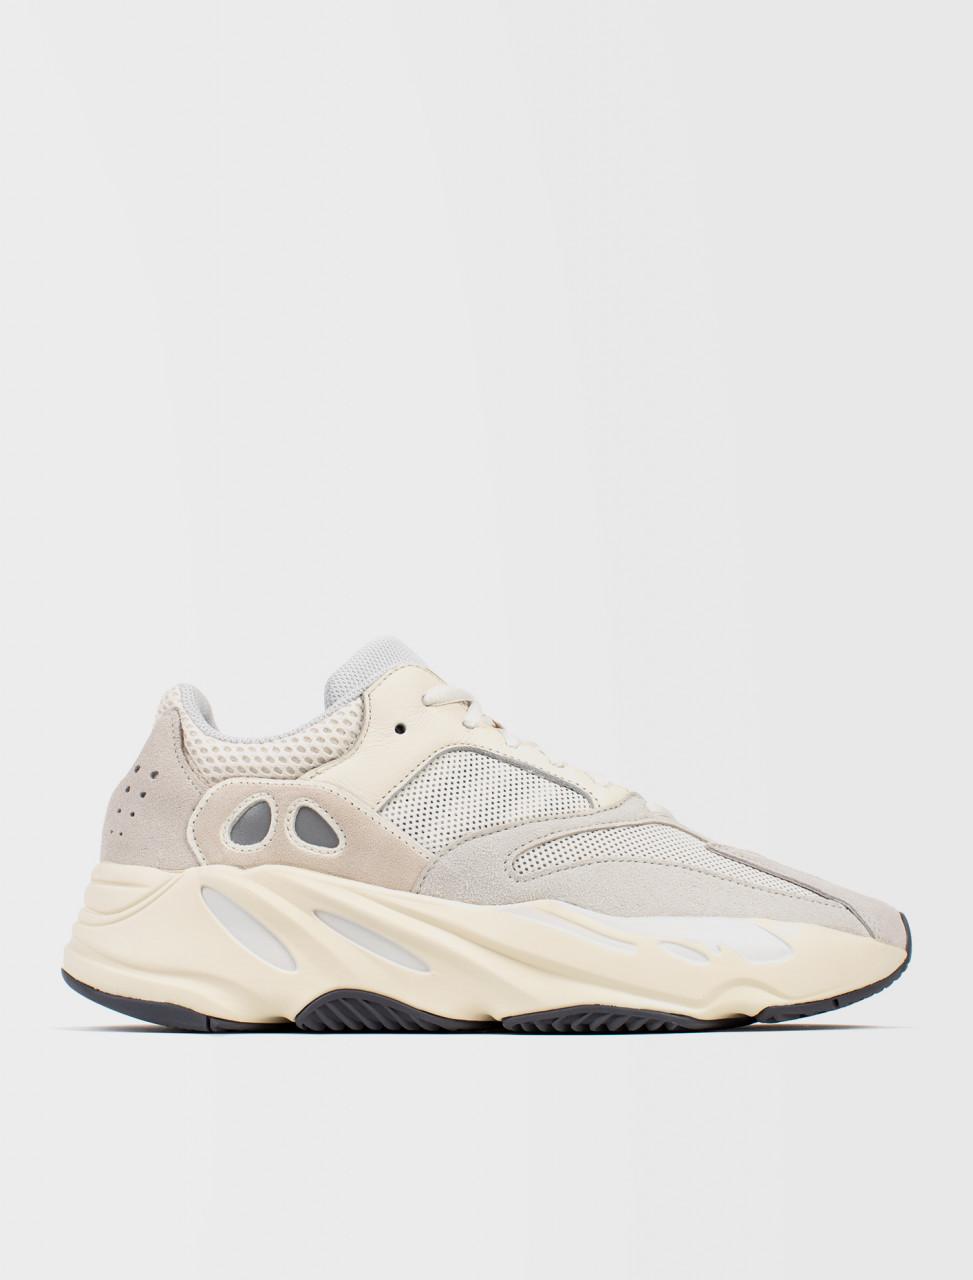 d8434ea3e Adidas Yeezy Boost 700 Sneaker